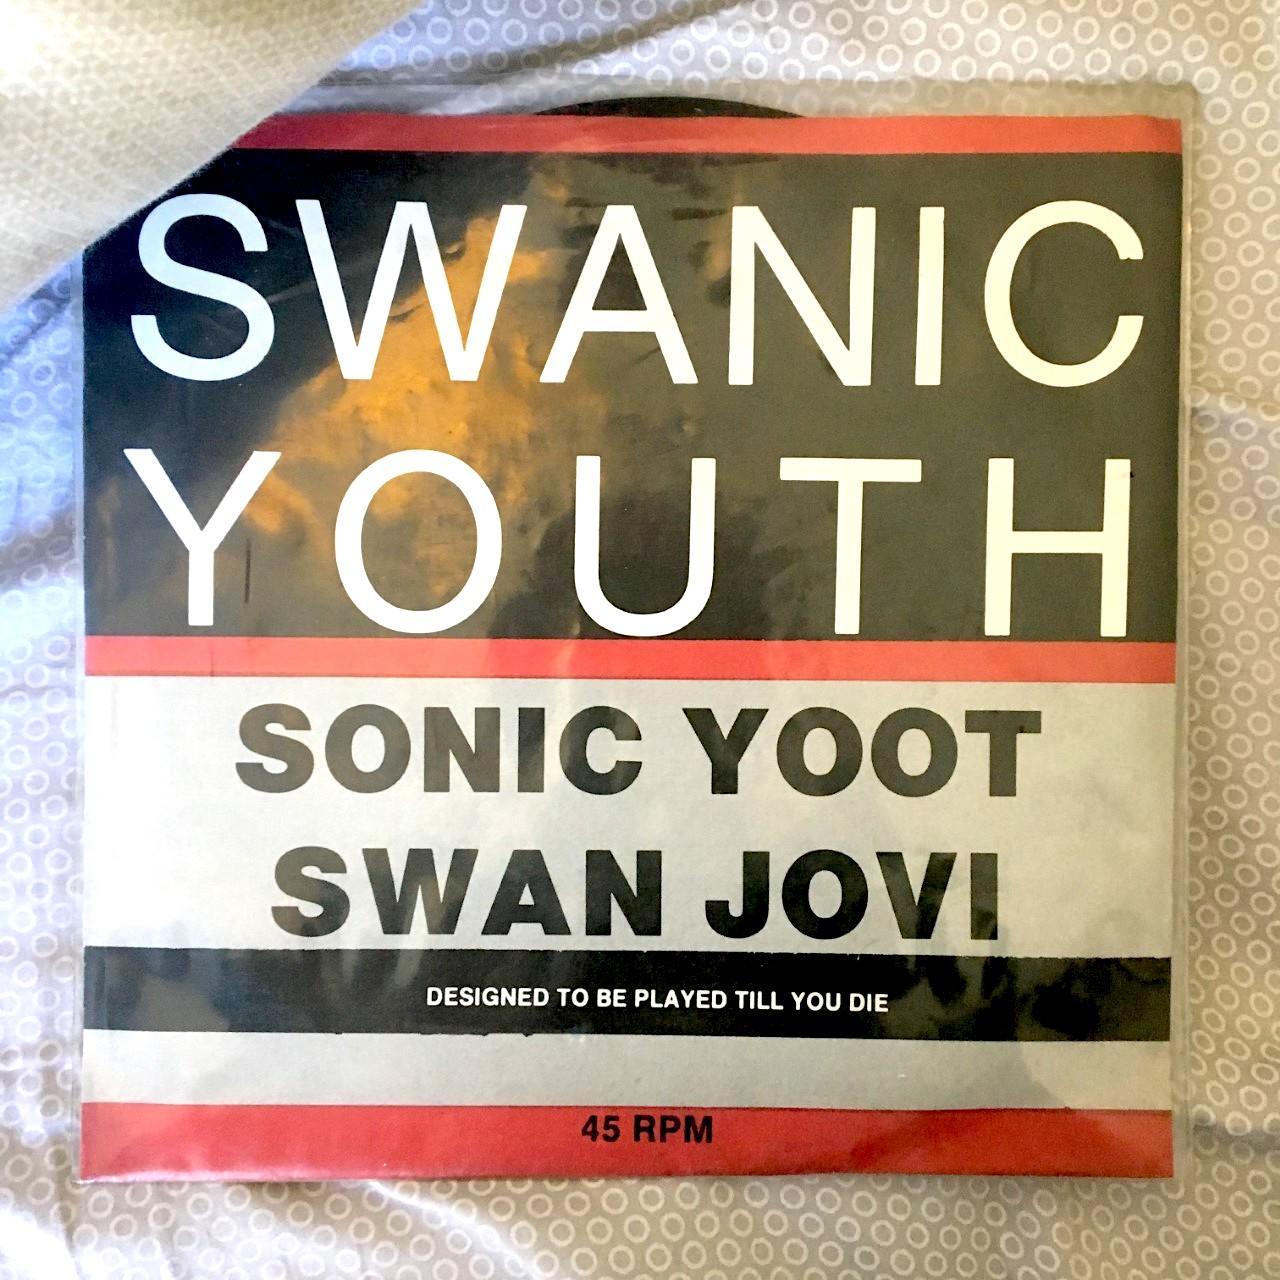 Swanic Youth